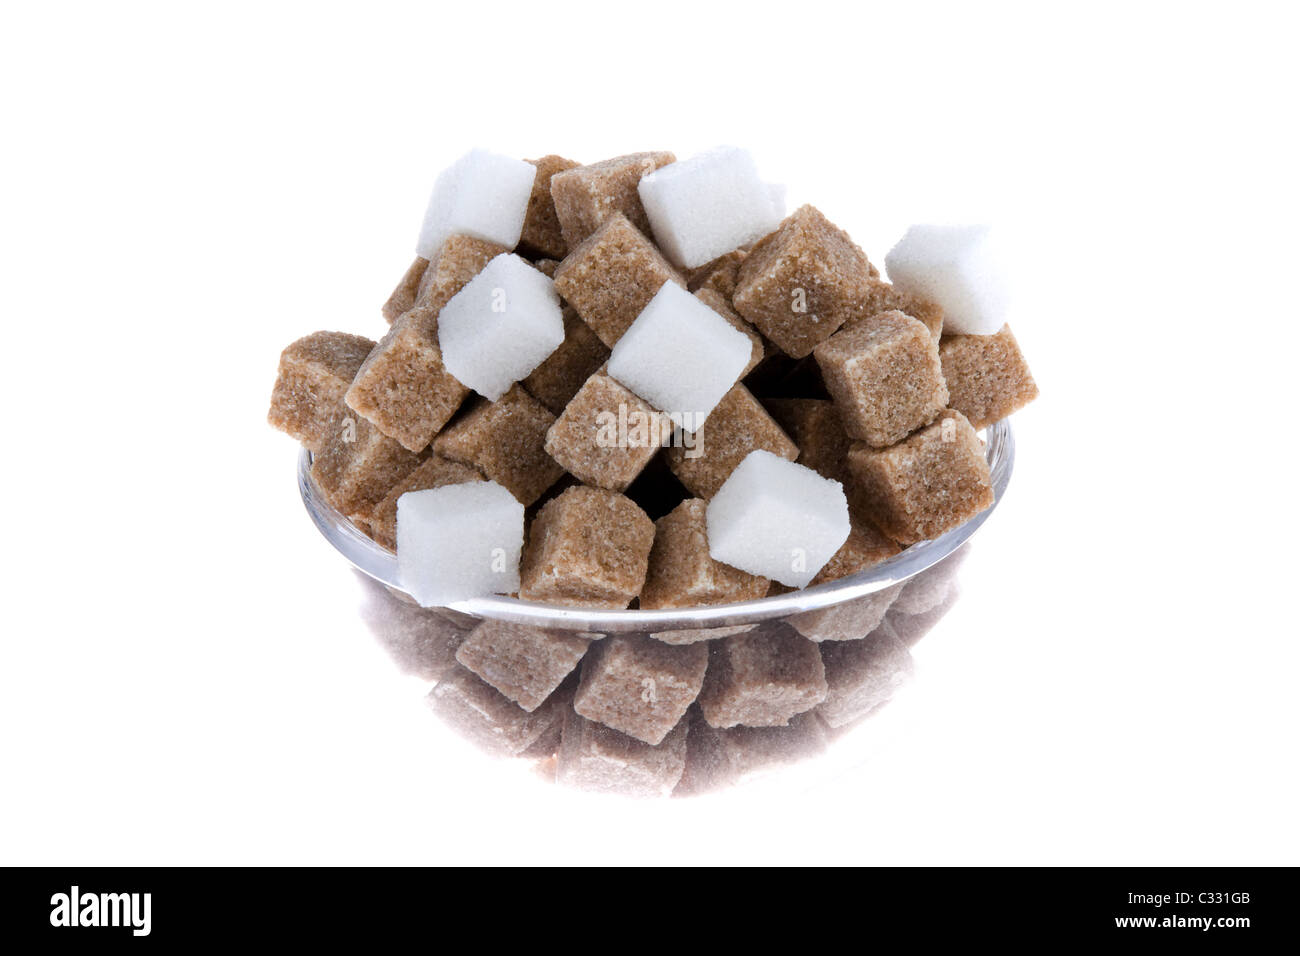 brwon sugar, carbohydrates - Stock Image